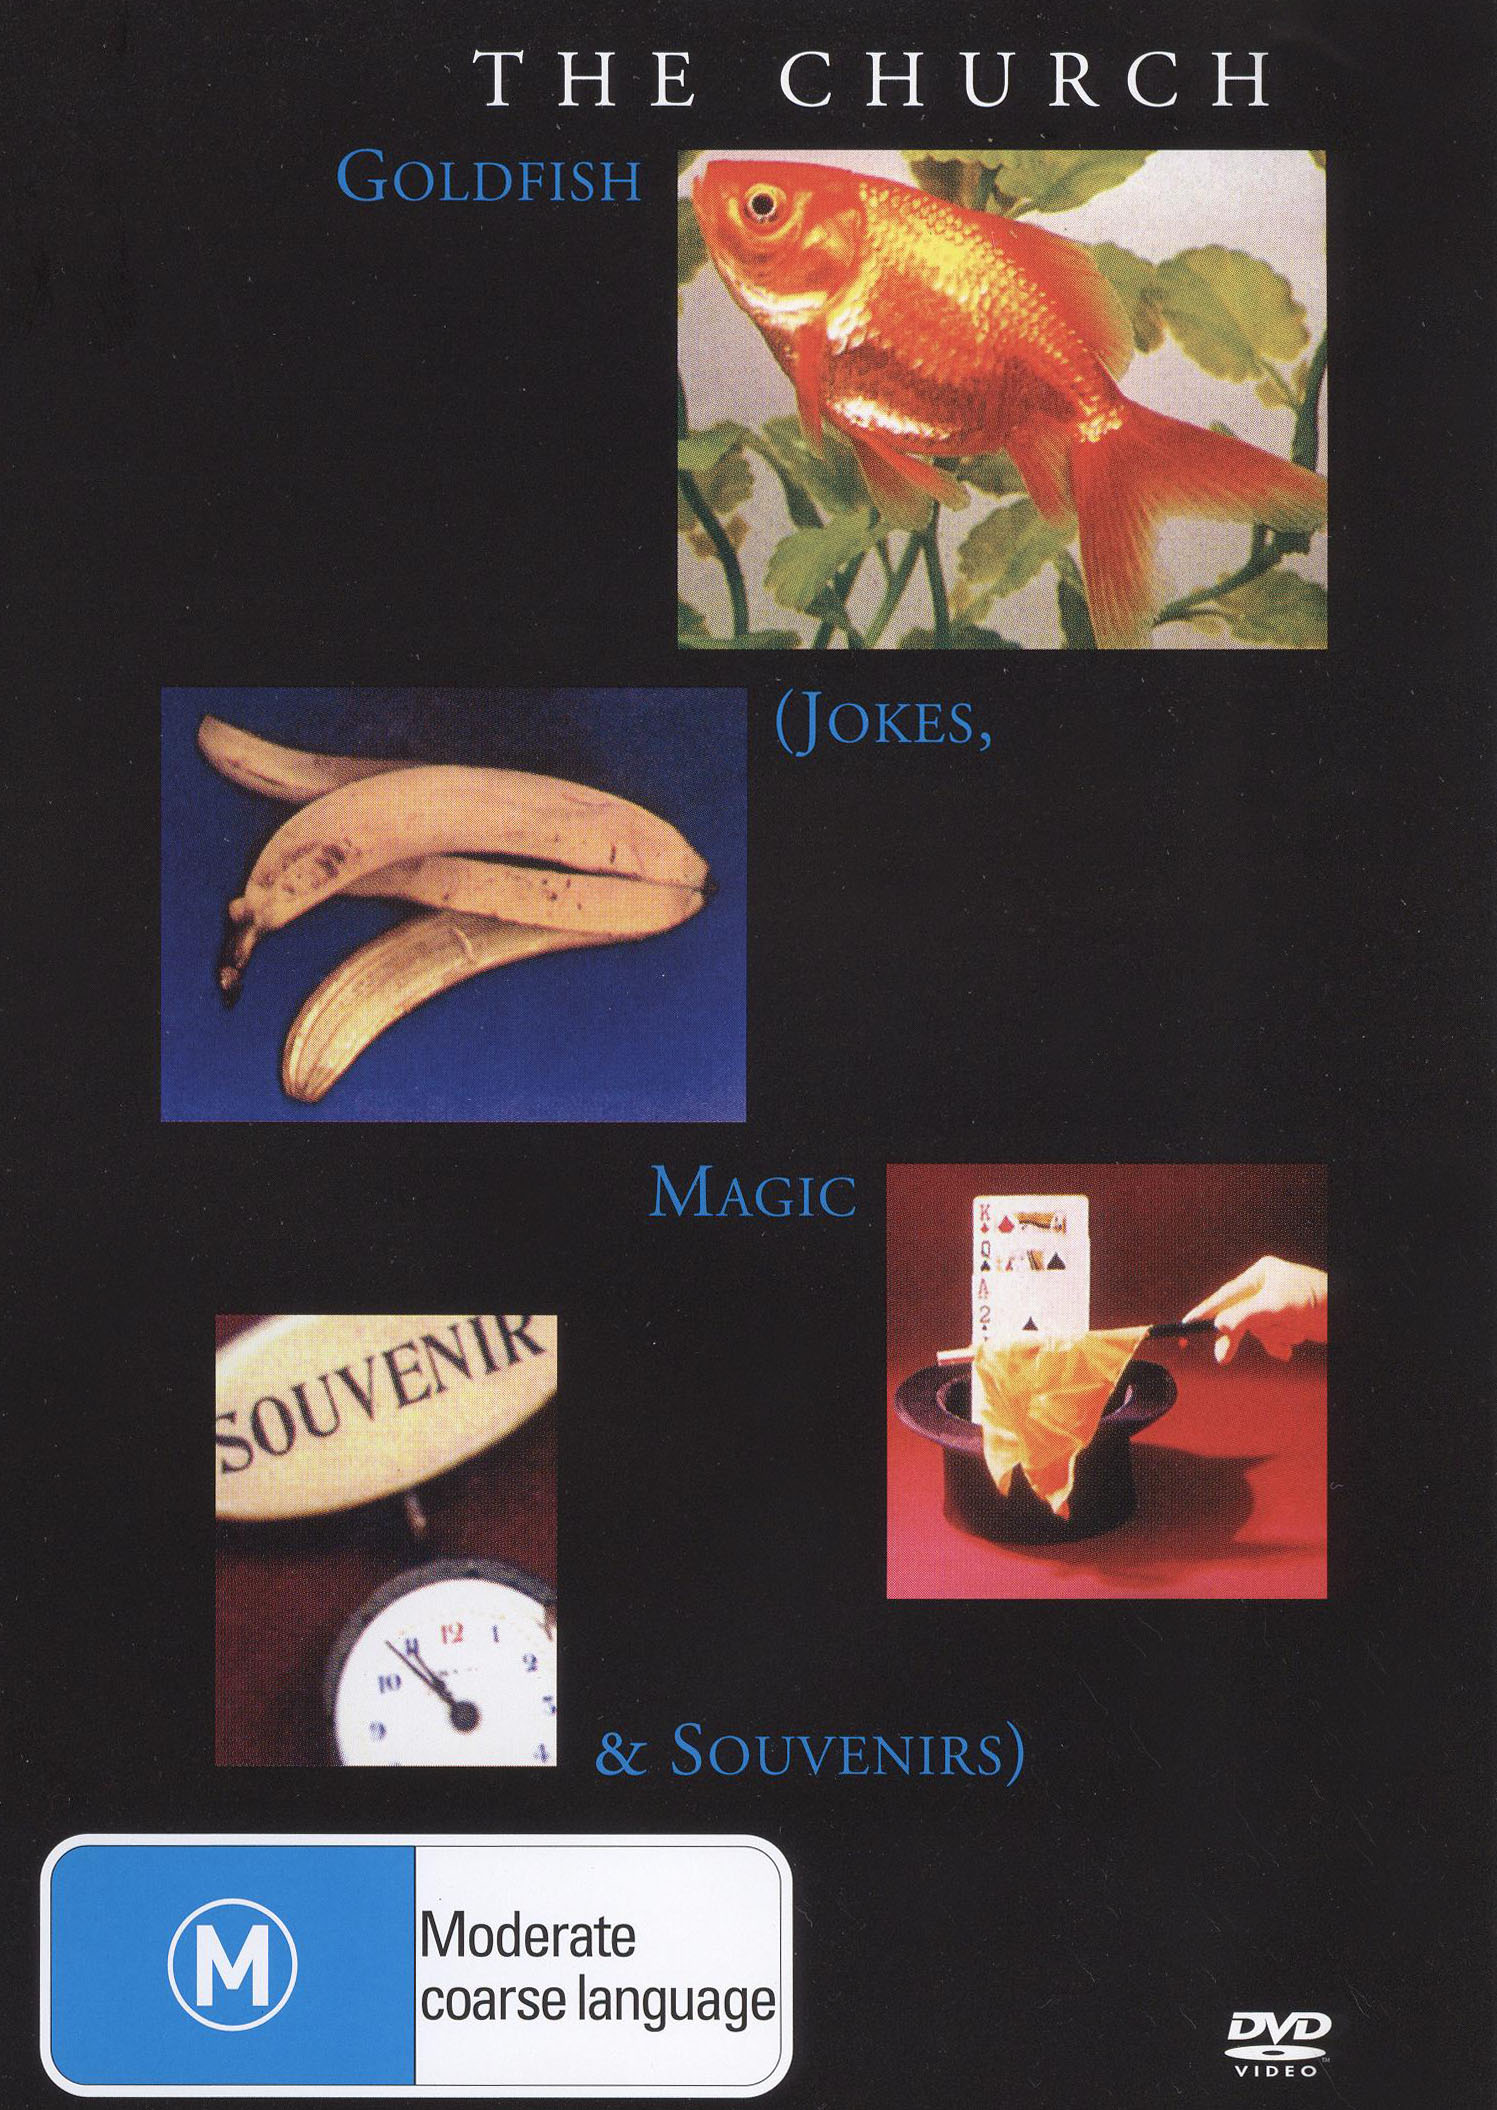 Church: Goldfish (Jokes, Magic and Souvenirs)